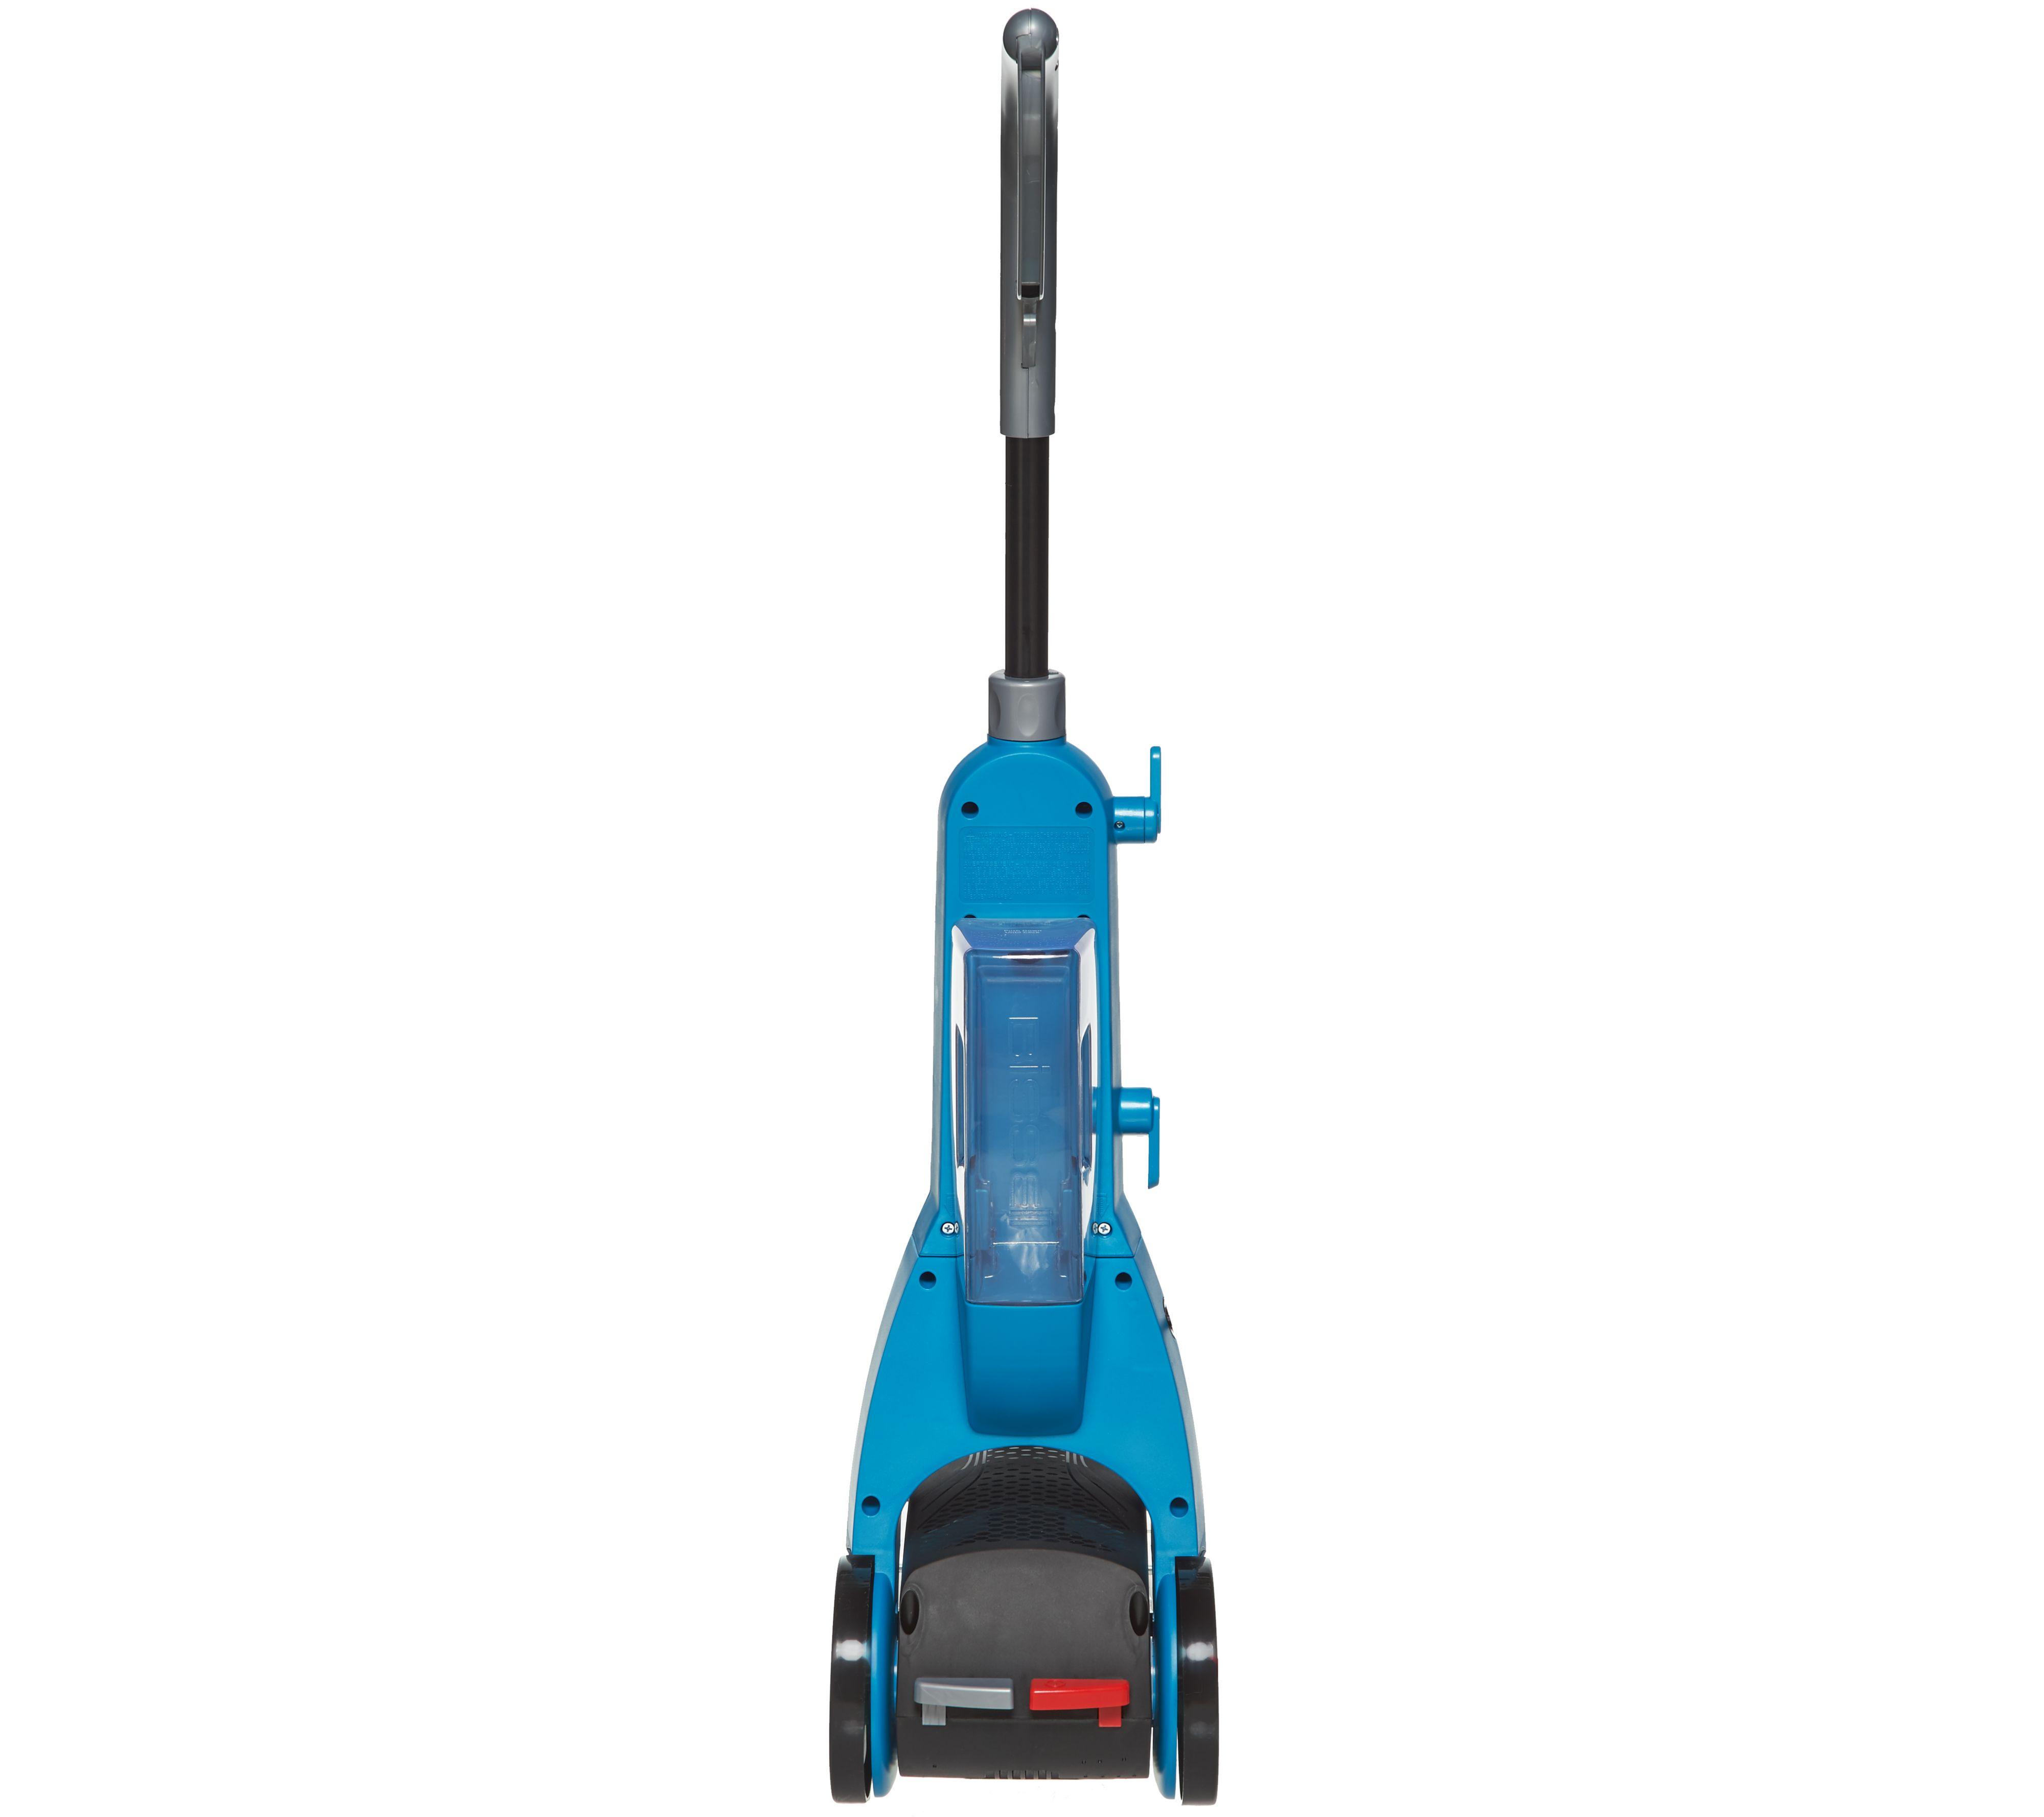 Bissell PowerClean Turbo Deep Clean Carpet & Rug Cleaner Page 1